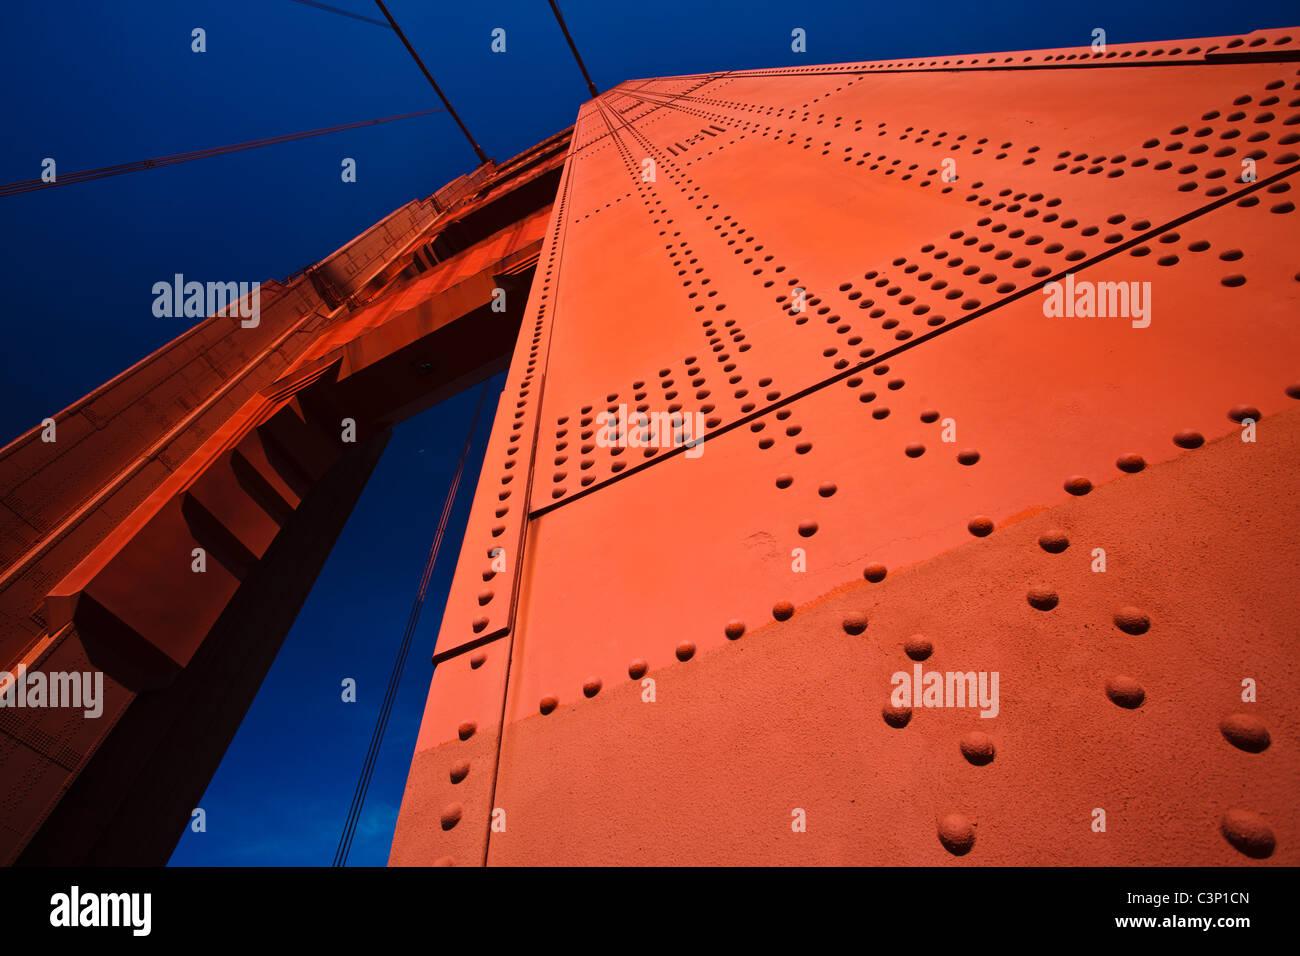 USA, San Francisco California - Architectural detail of Golden Gate Bridge Tower - Stock Image